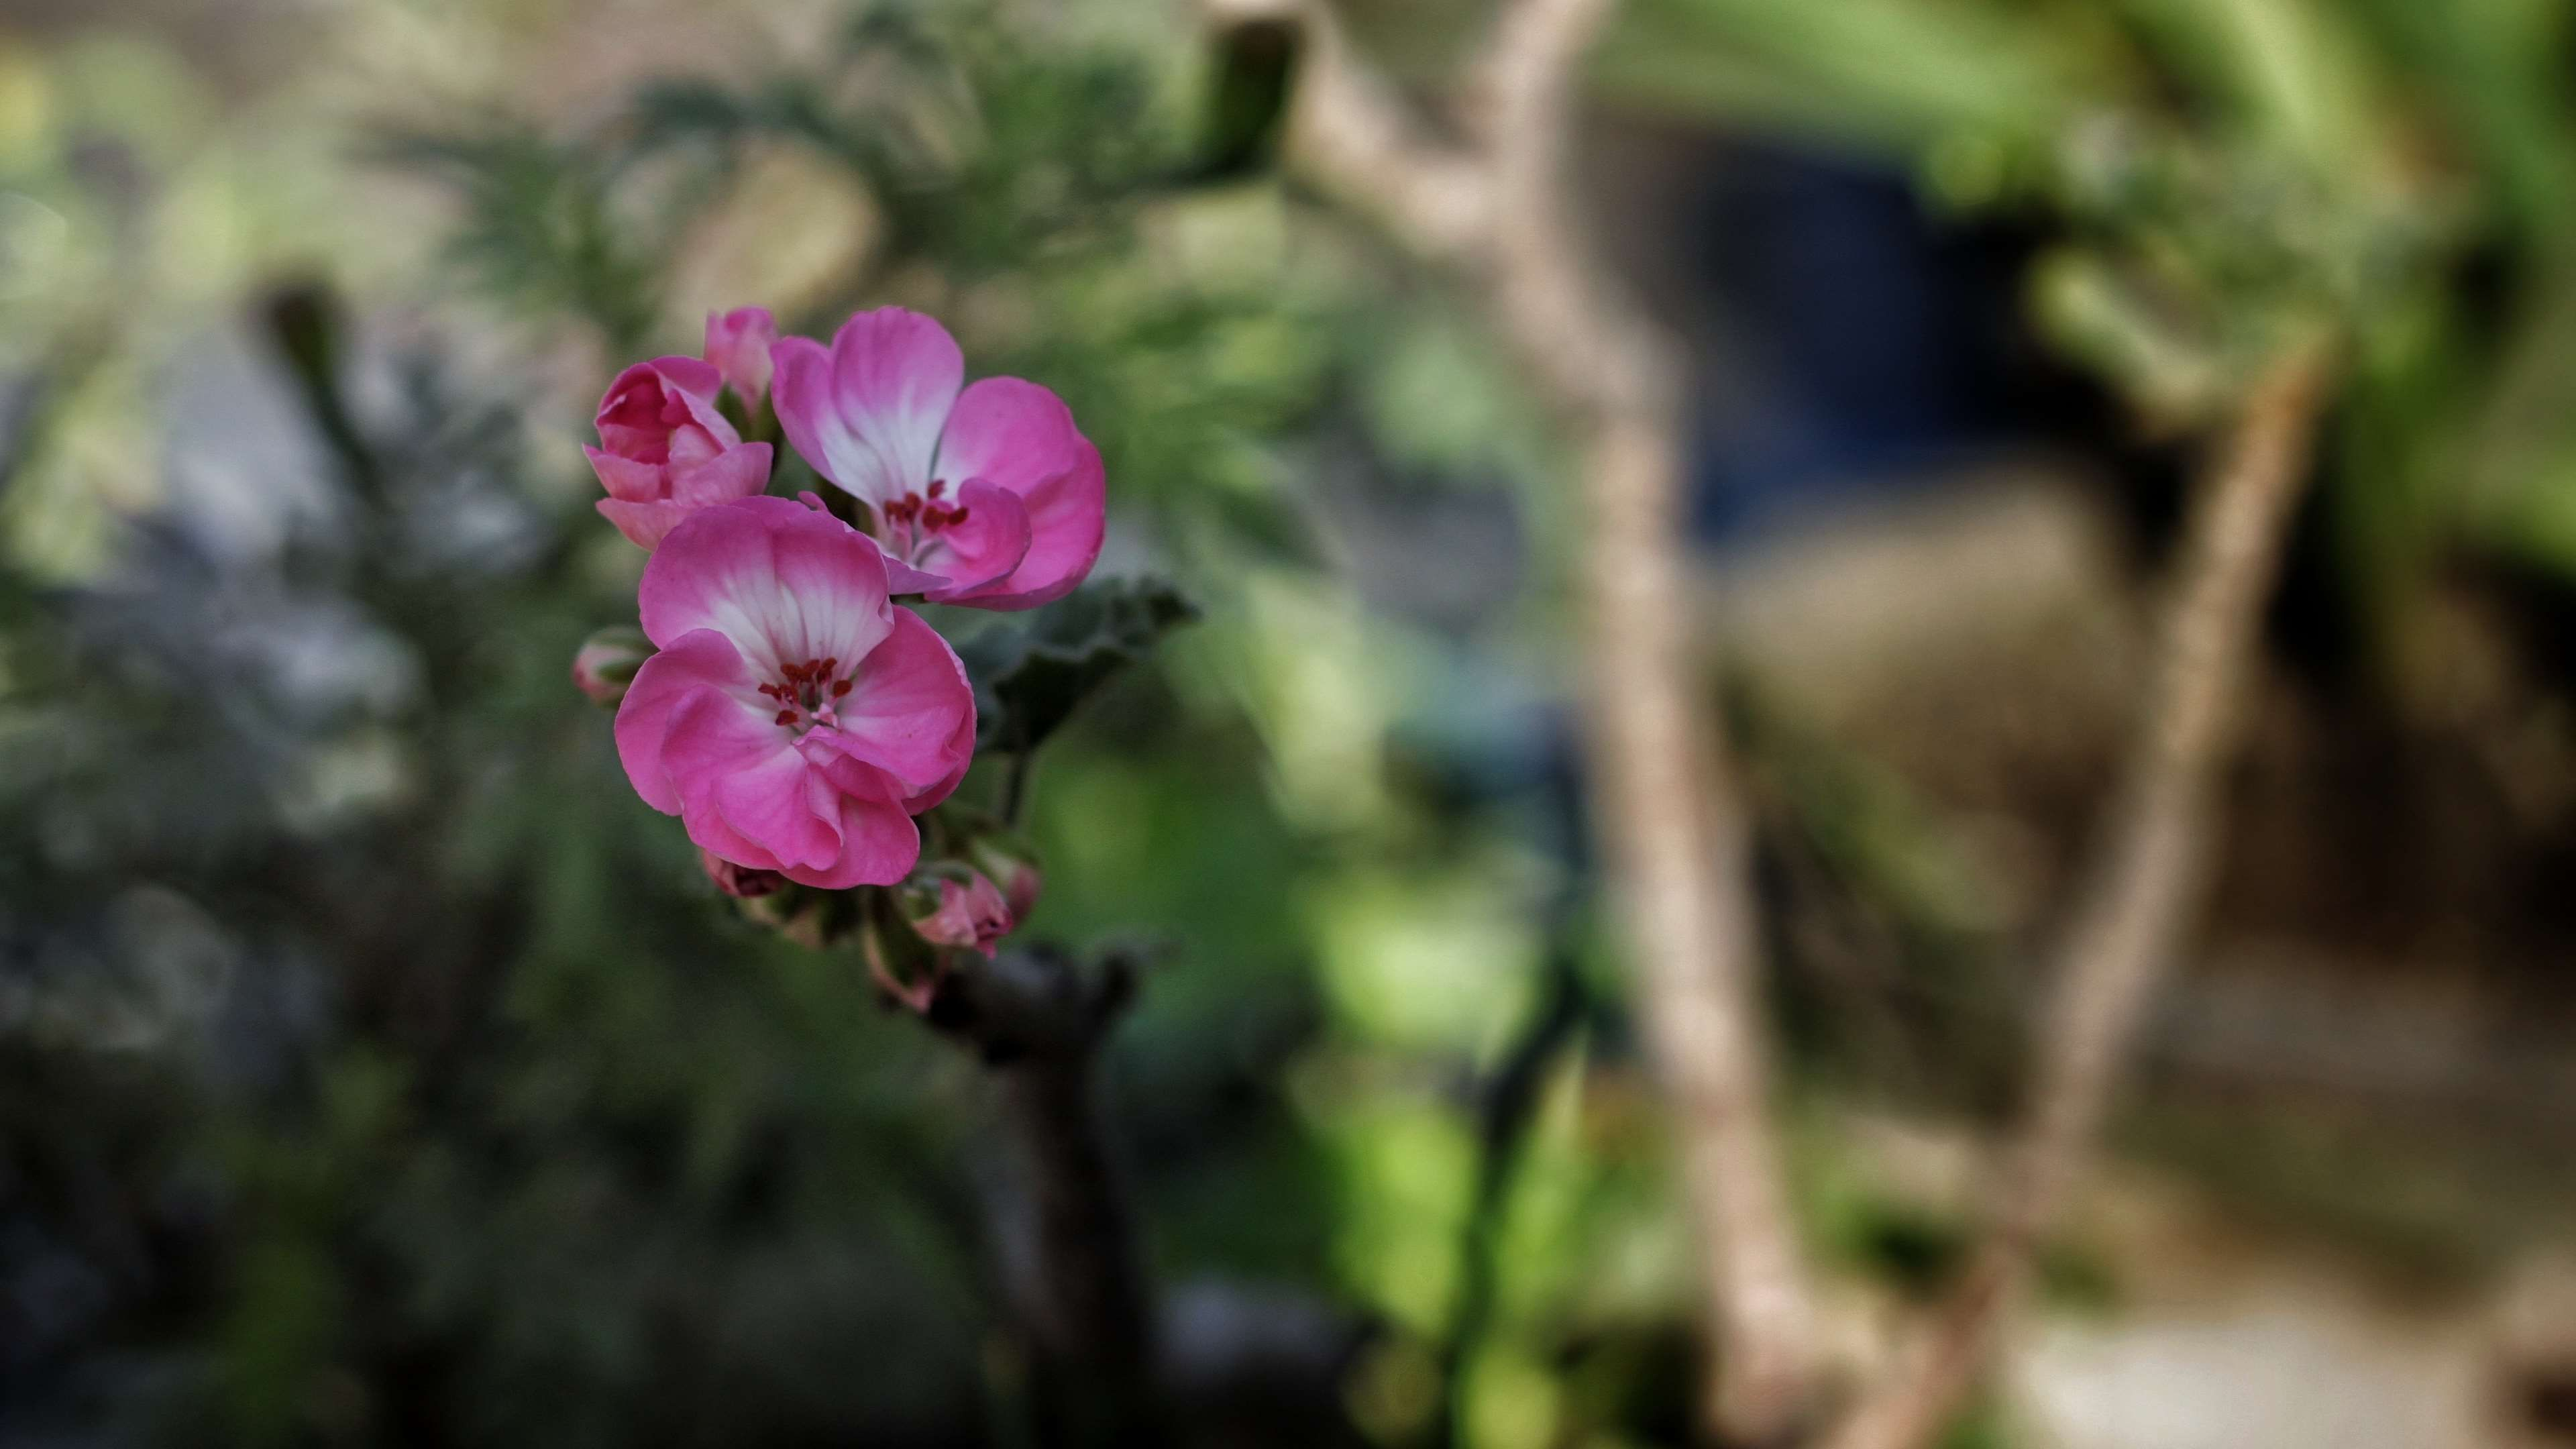 Beautiful beautiful flowers bloom blooming blur blurred beautiful beautiful flowers bloom blooming blur blurred background bokeh izmirmasajfo Images